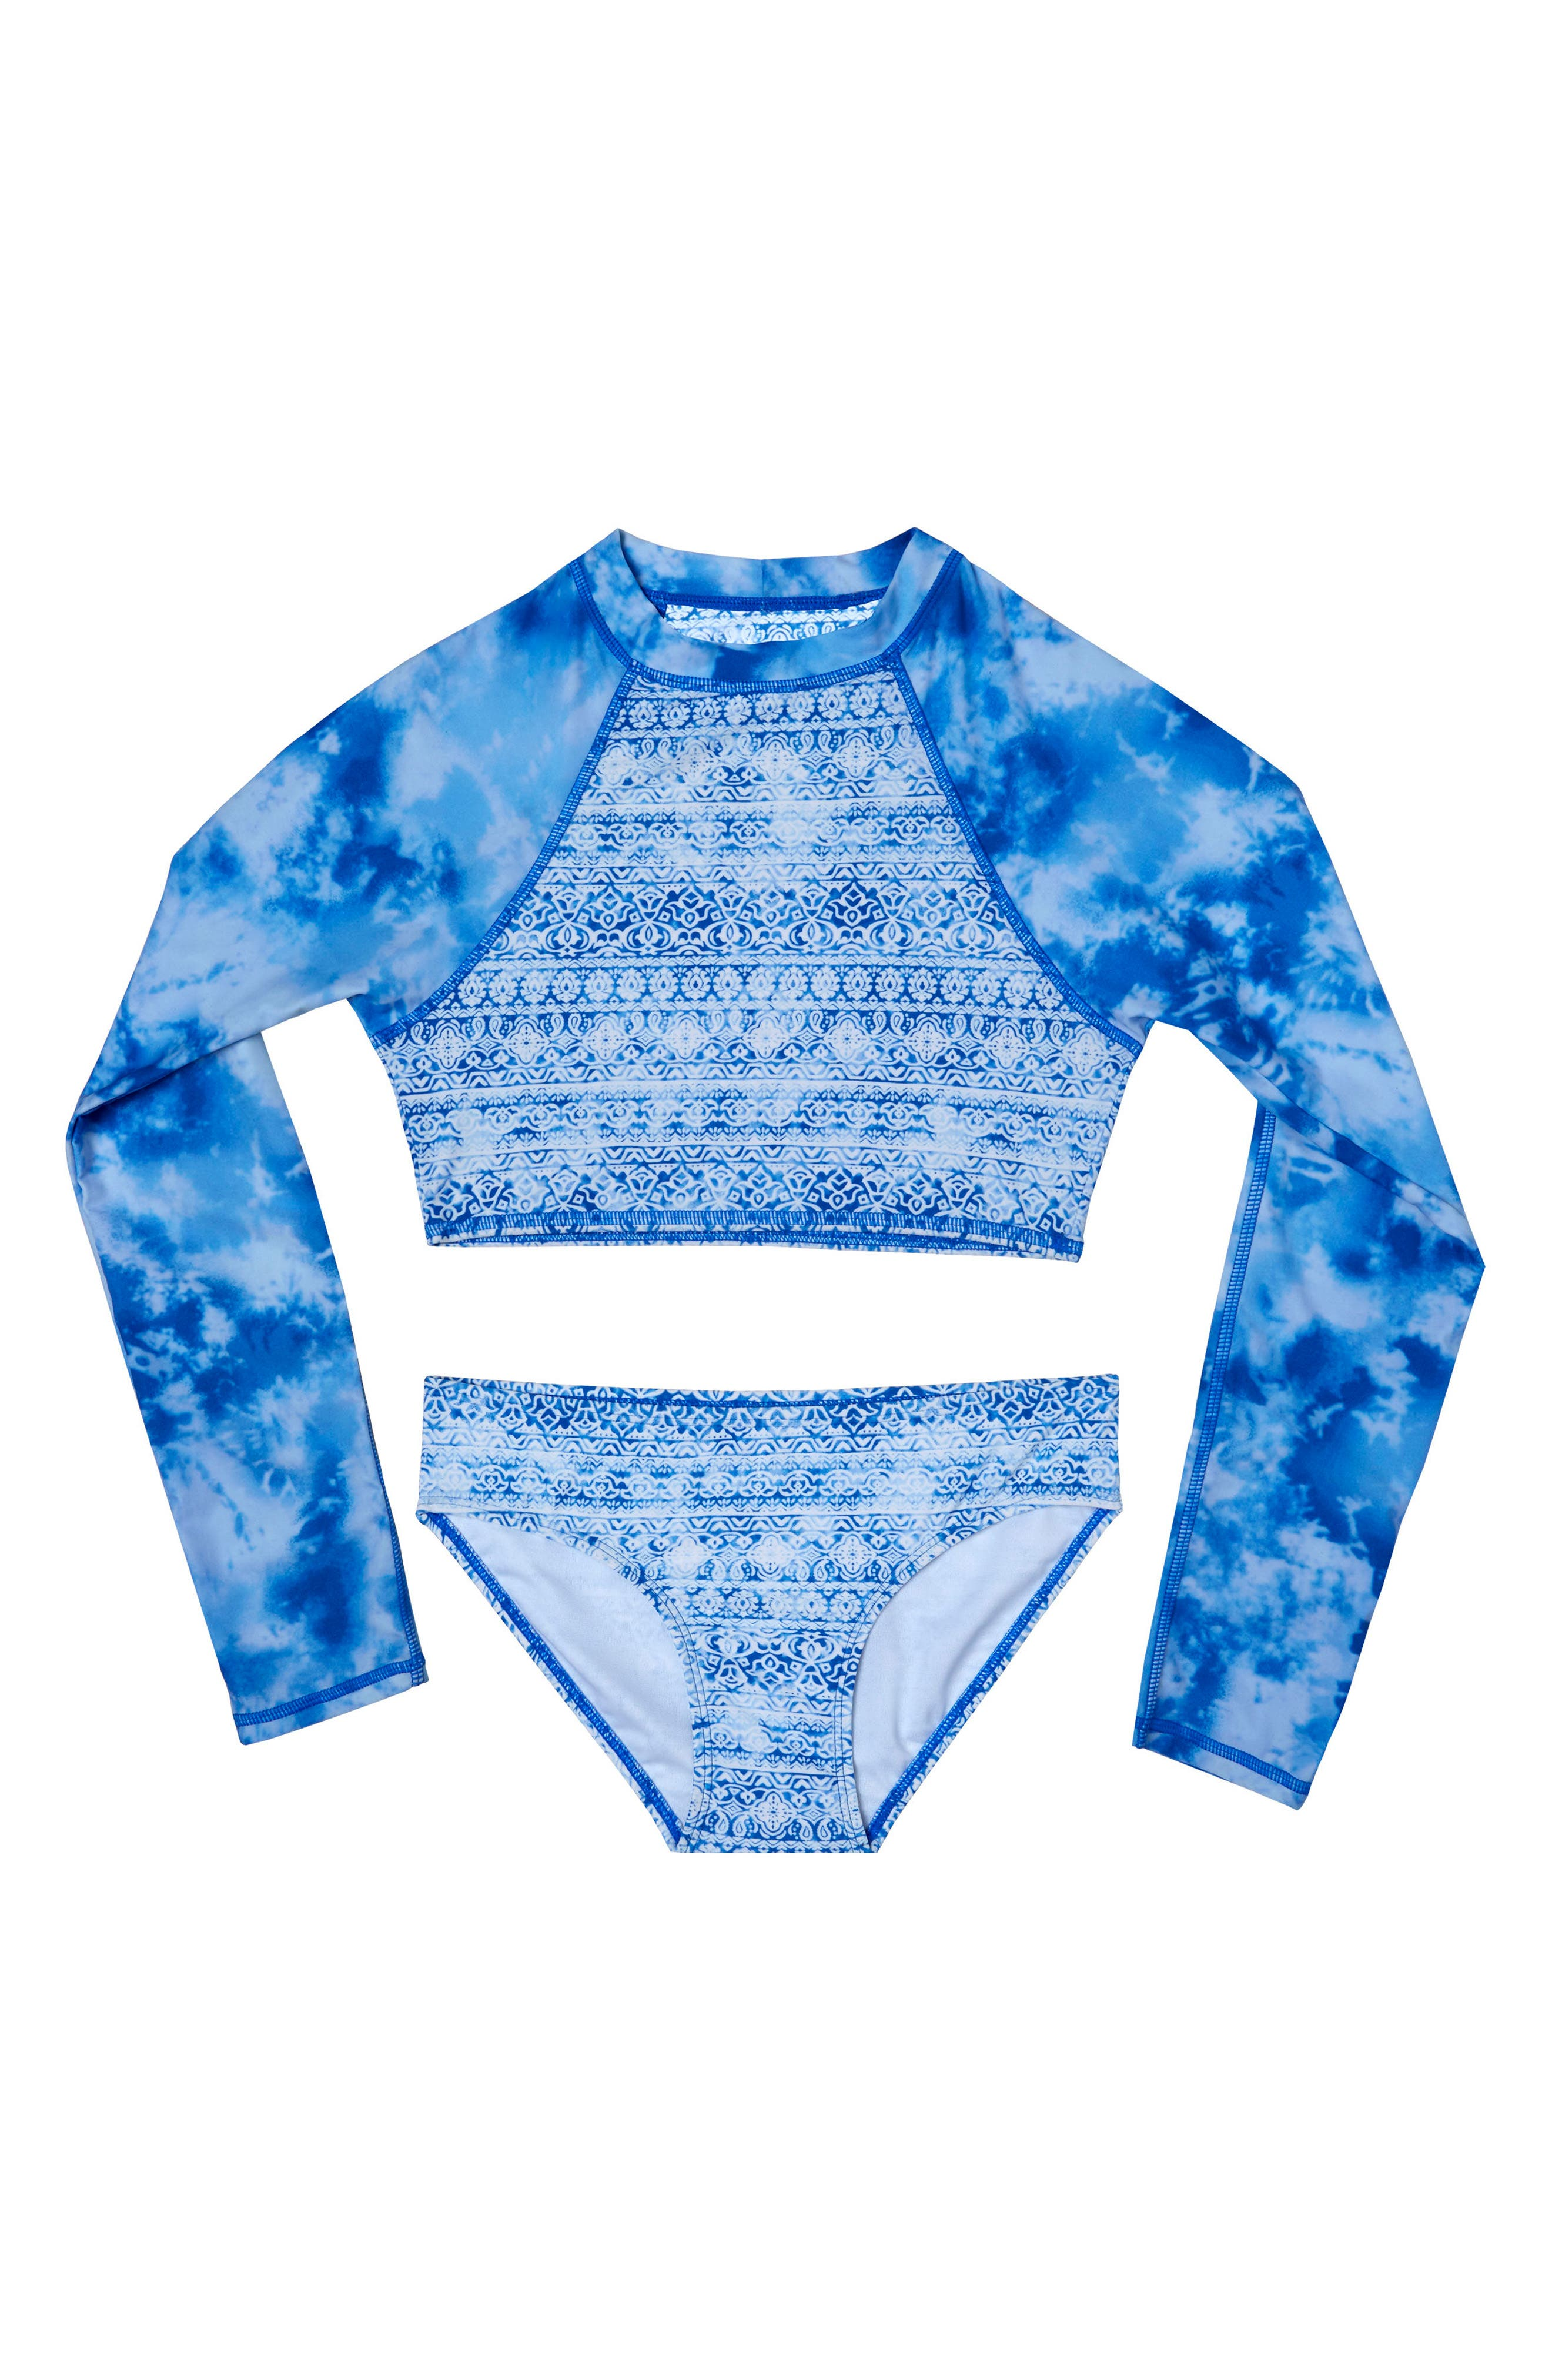 Jeans Addiction Two-Piece Rashguard Swimsuit,                         Main,                         color, 400